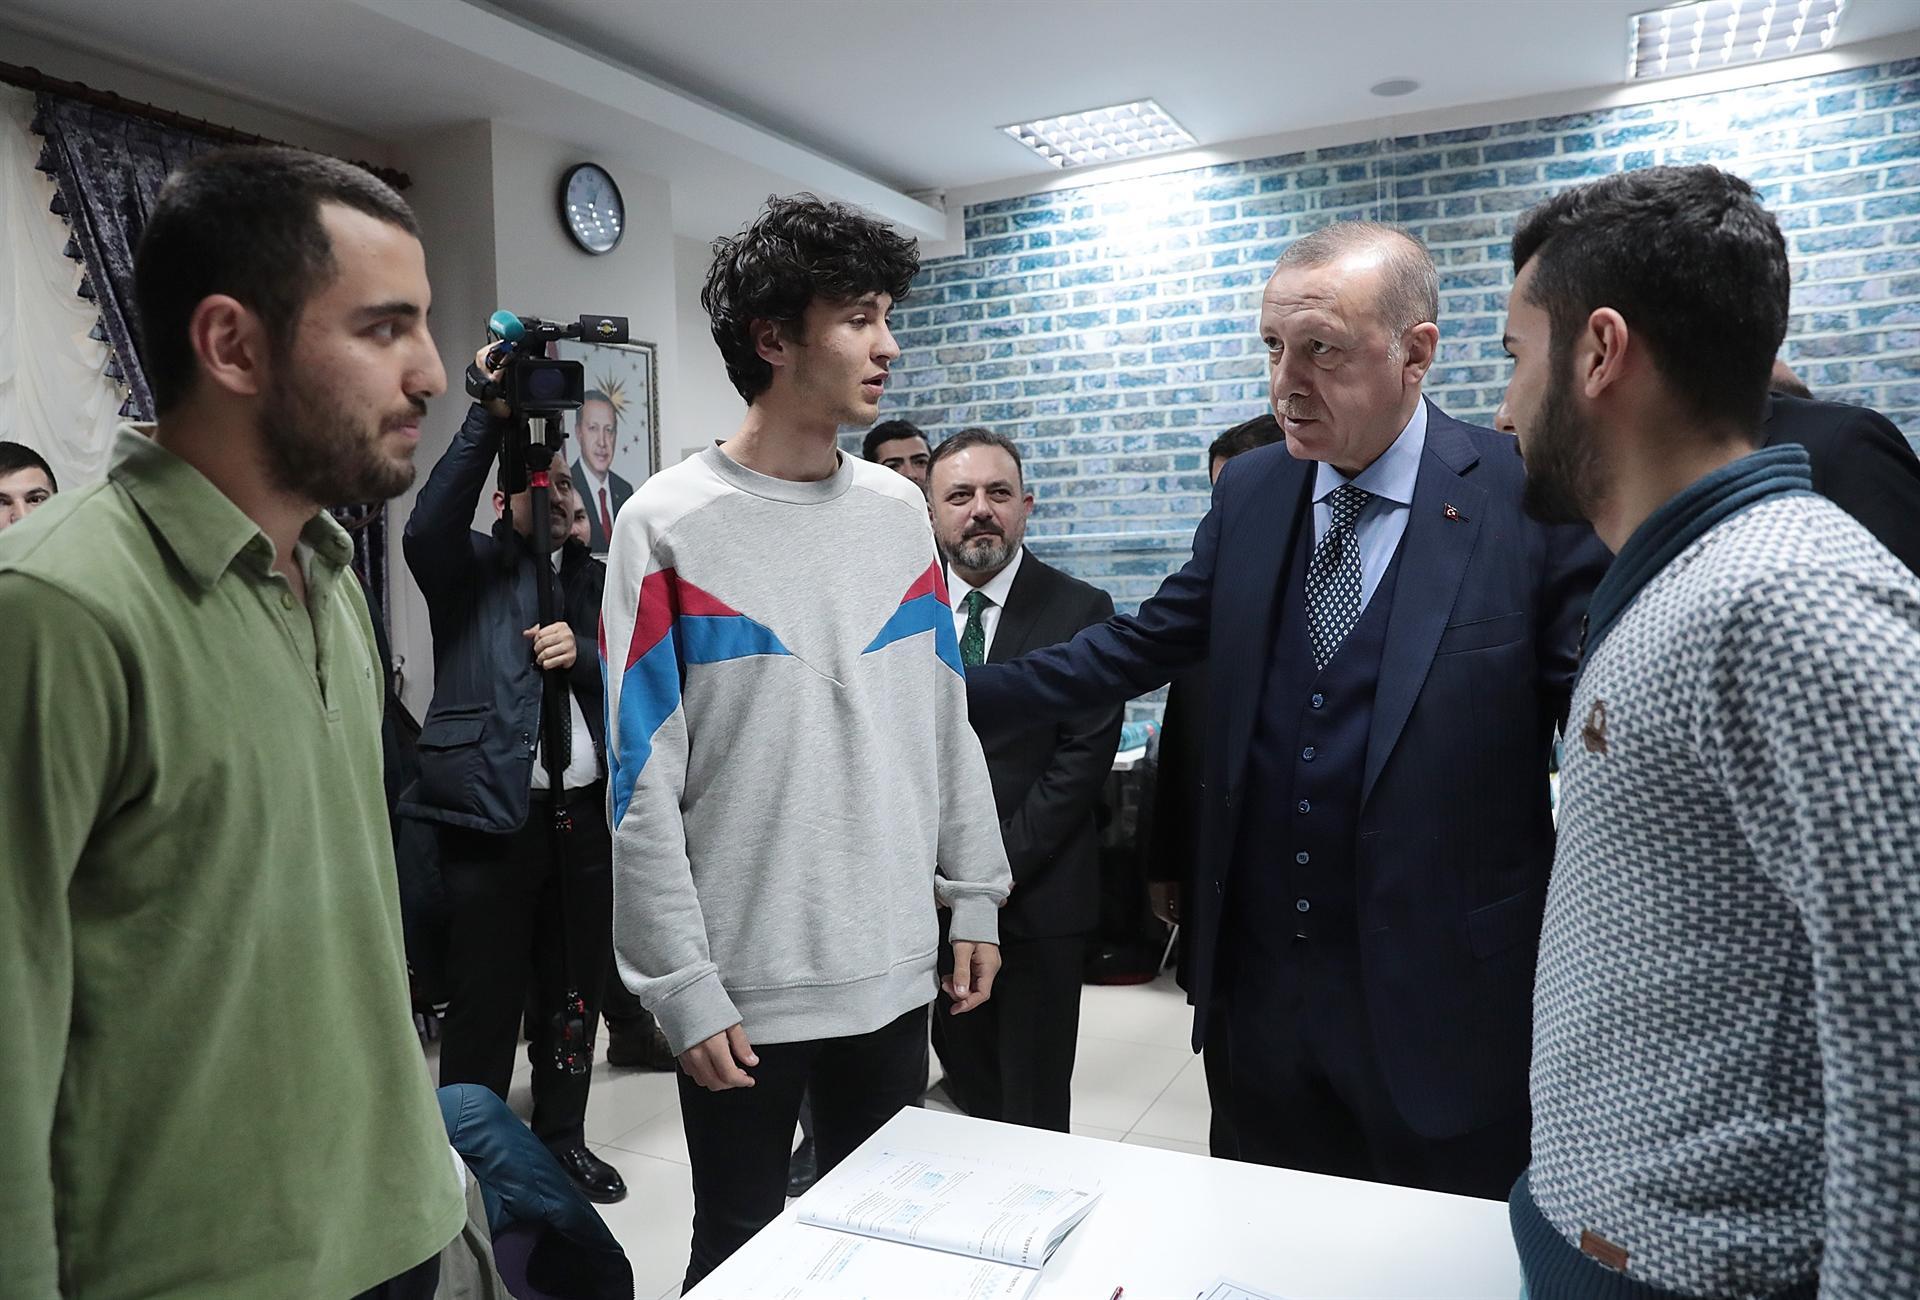 Cumhurbaşkanı Erdoğan'dan Ankara'ya metrobüs müjdesi